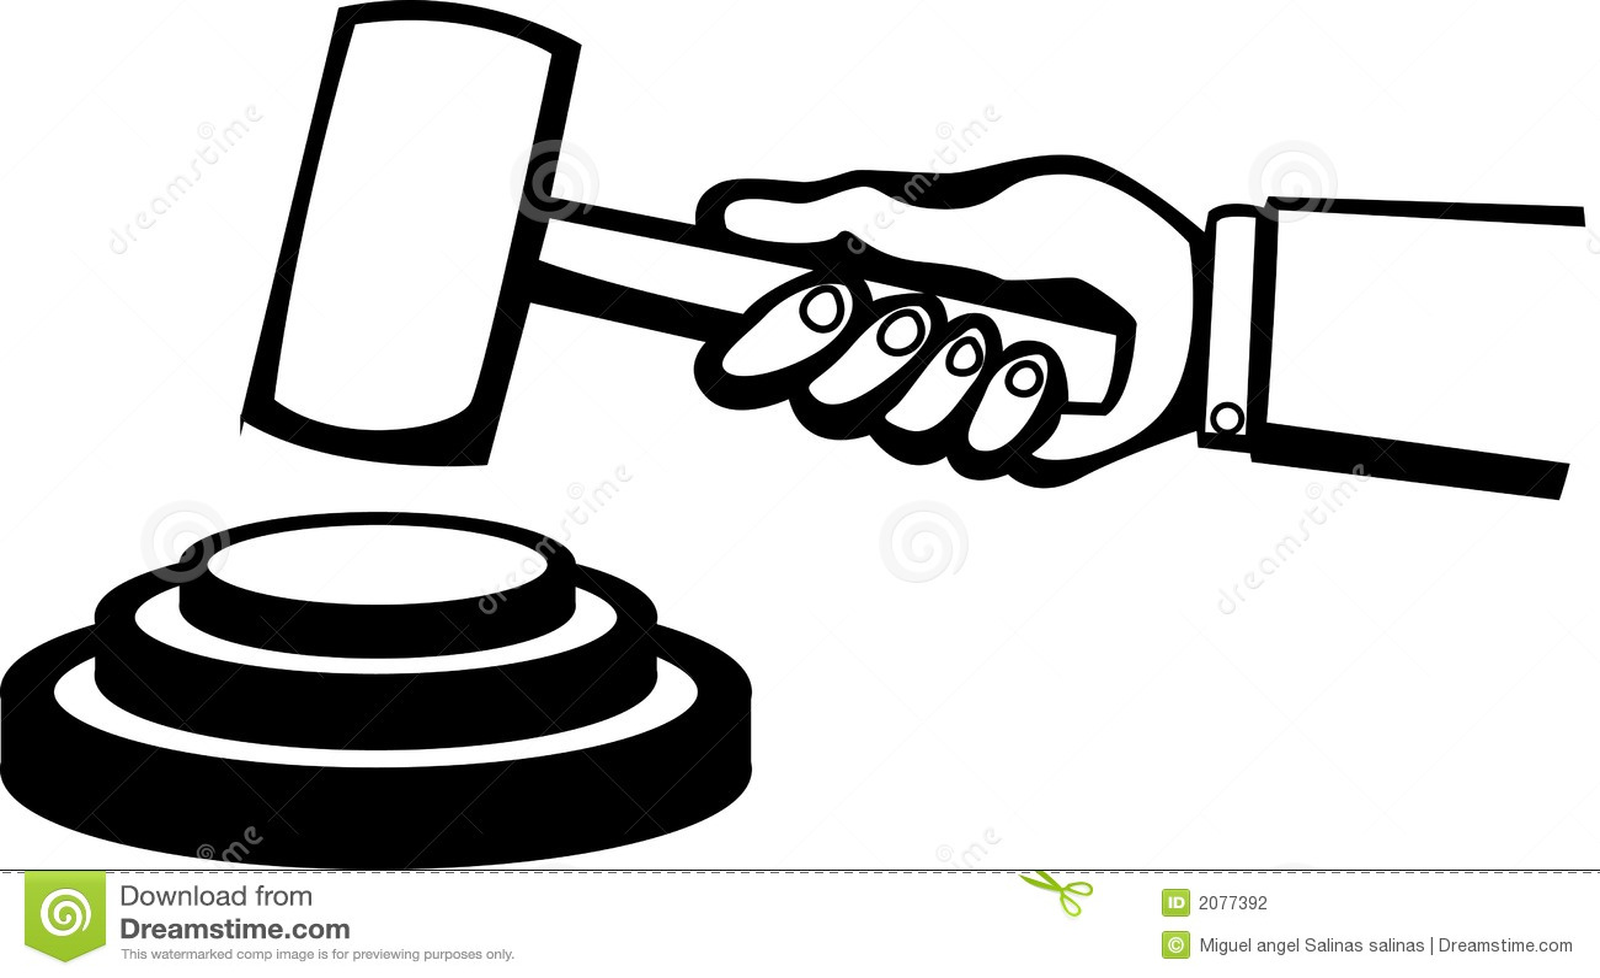 Vector Illustration Hammer: Judge Or Auction Hammer Vector Illustration Stock